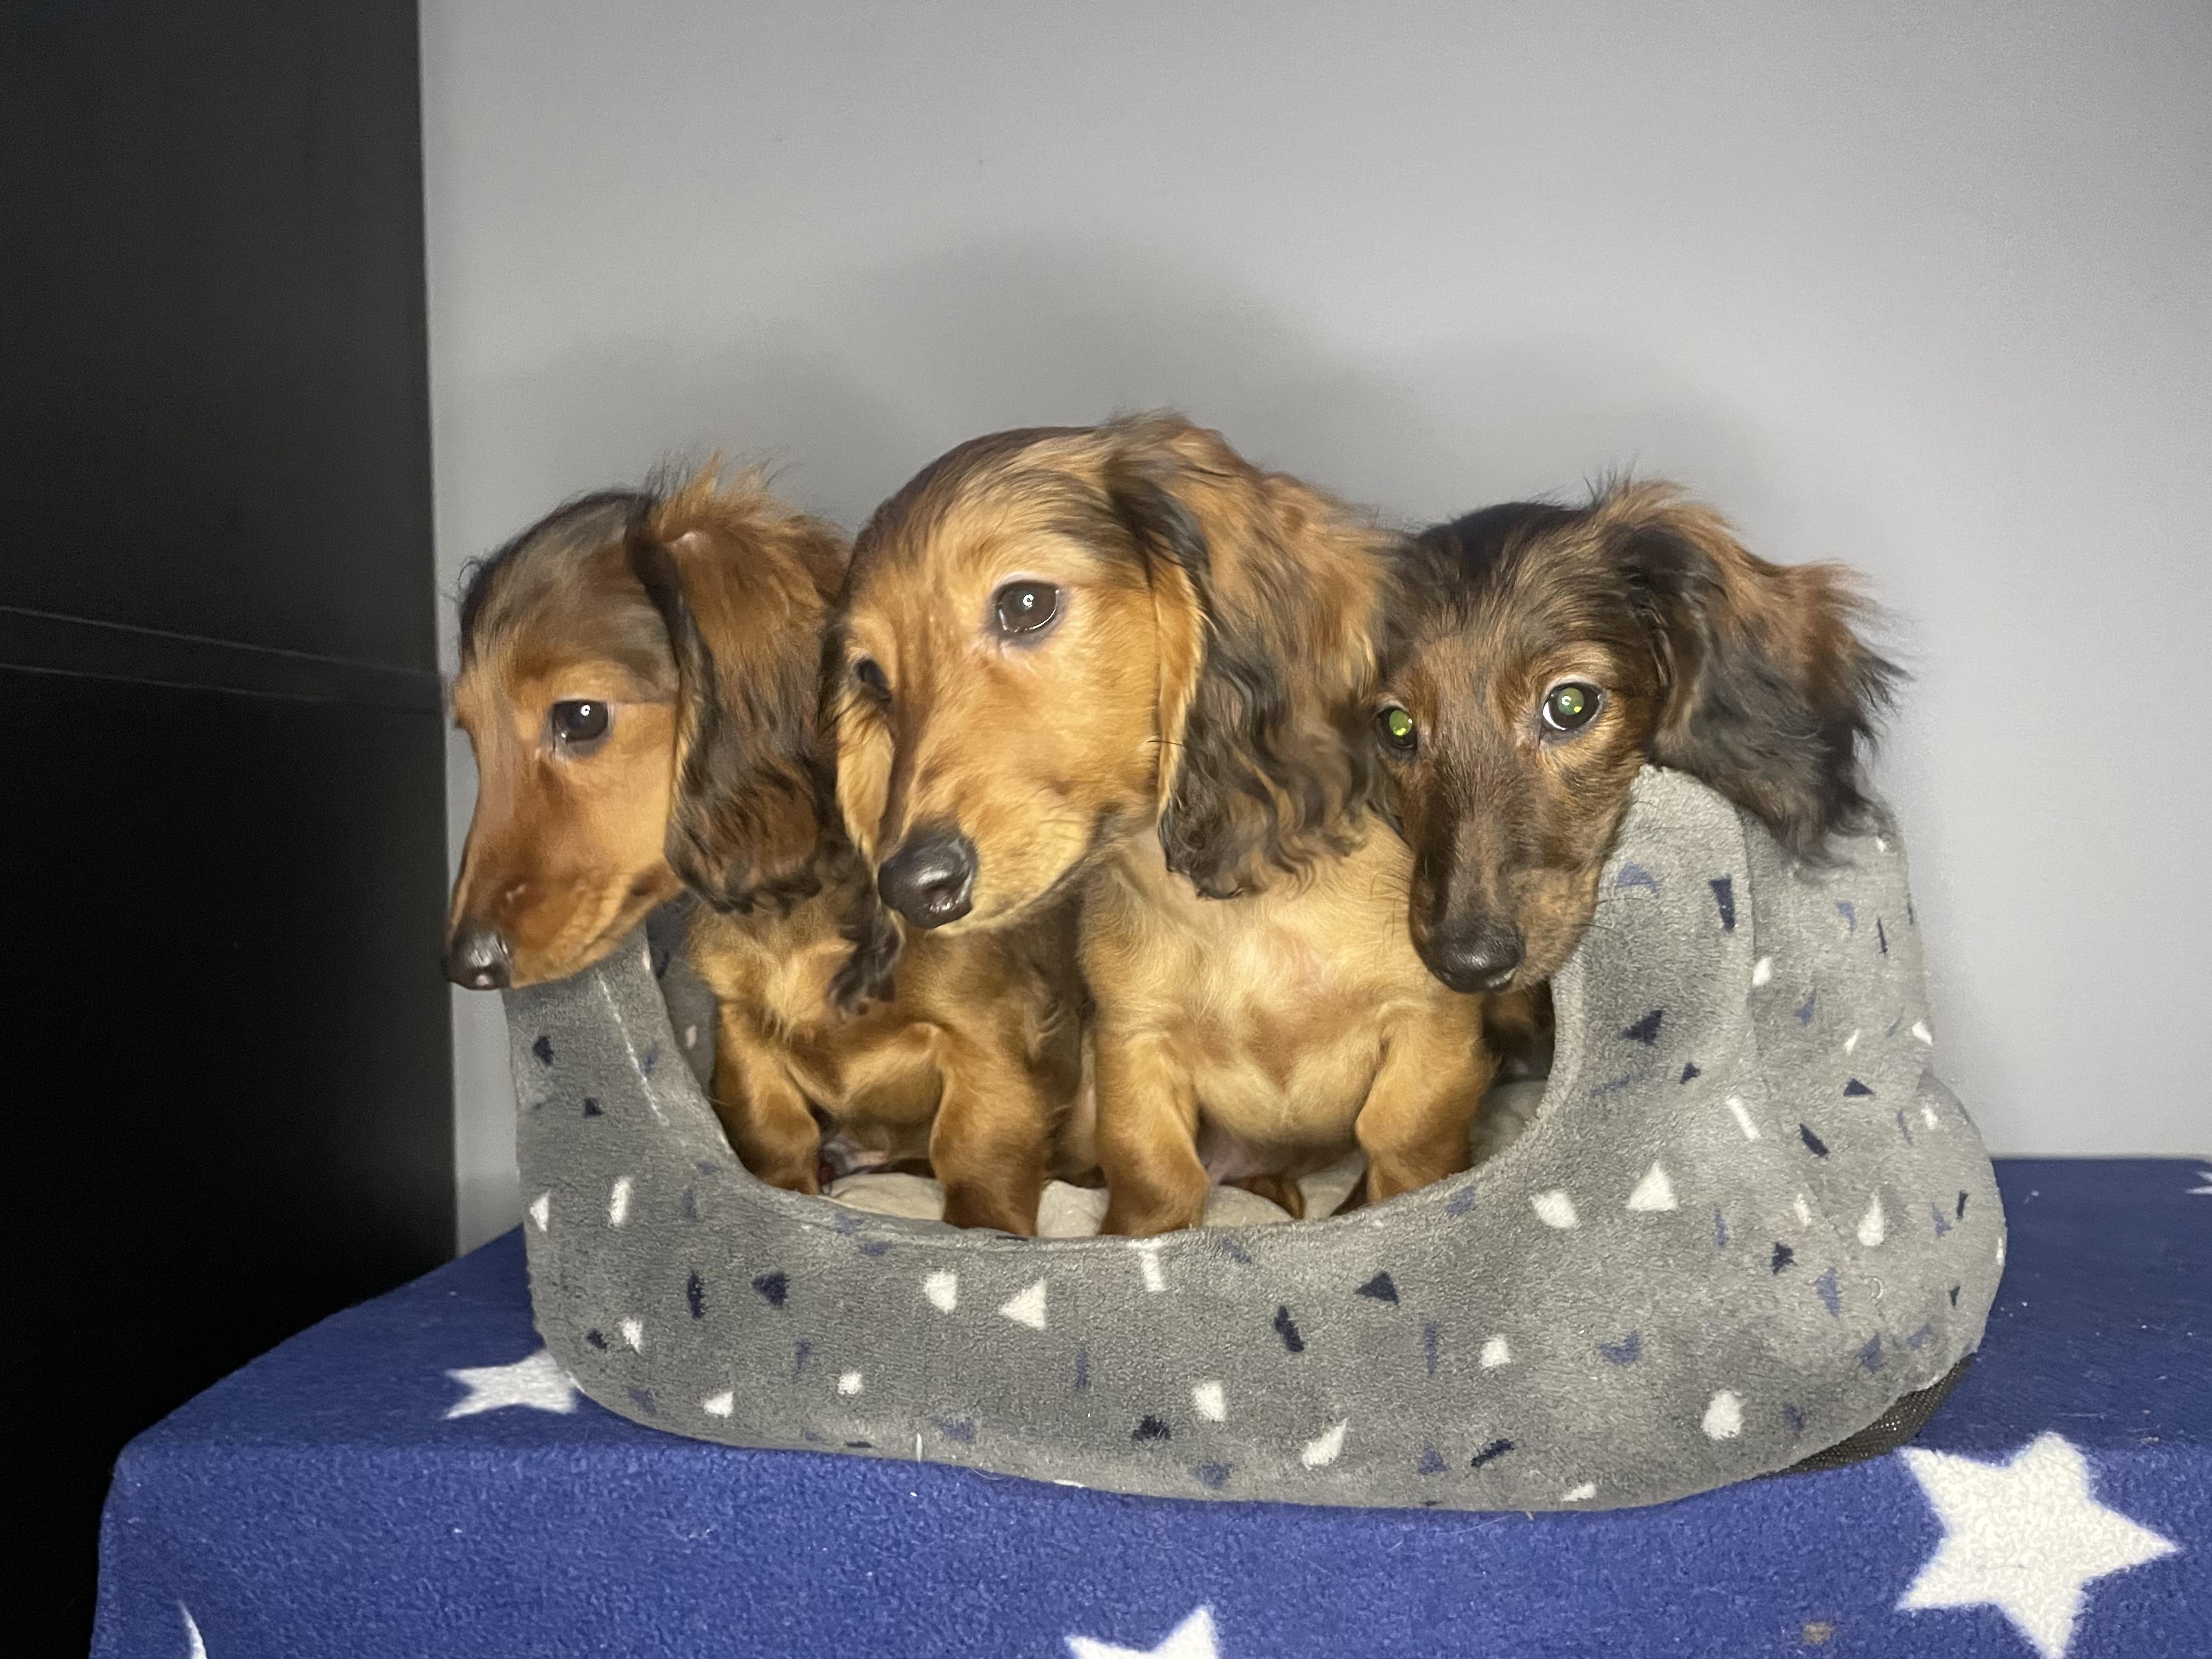 Main puppy image